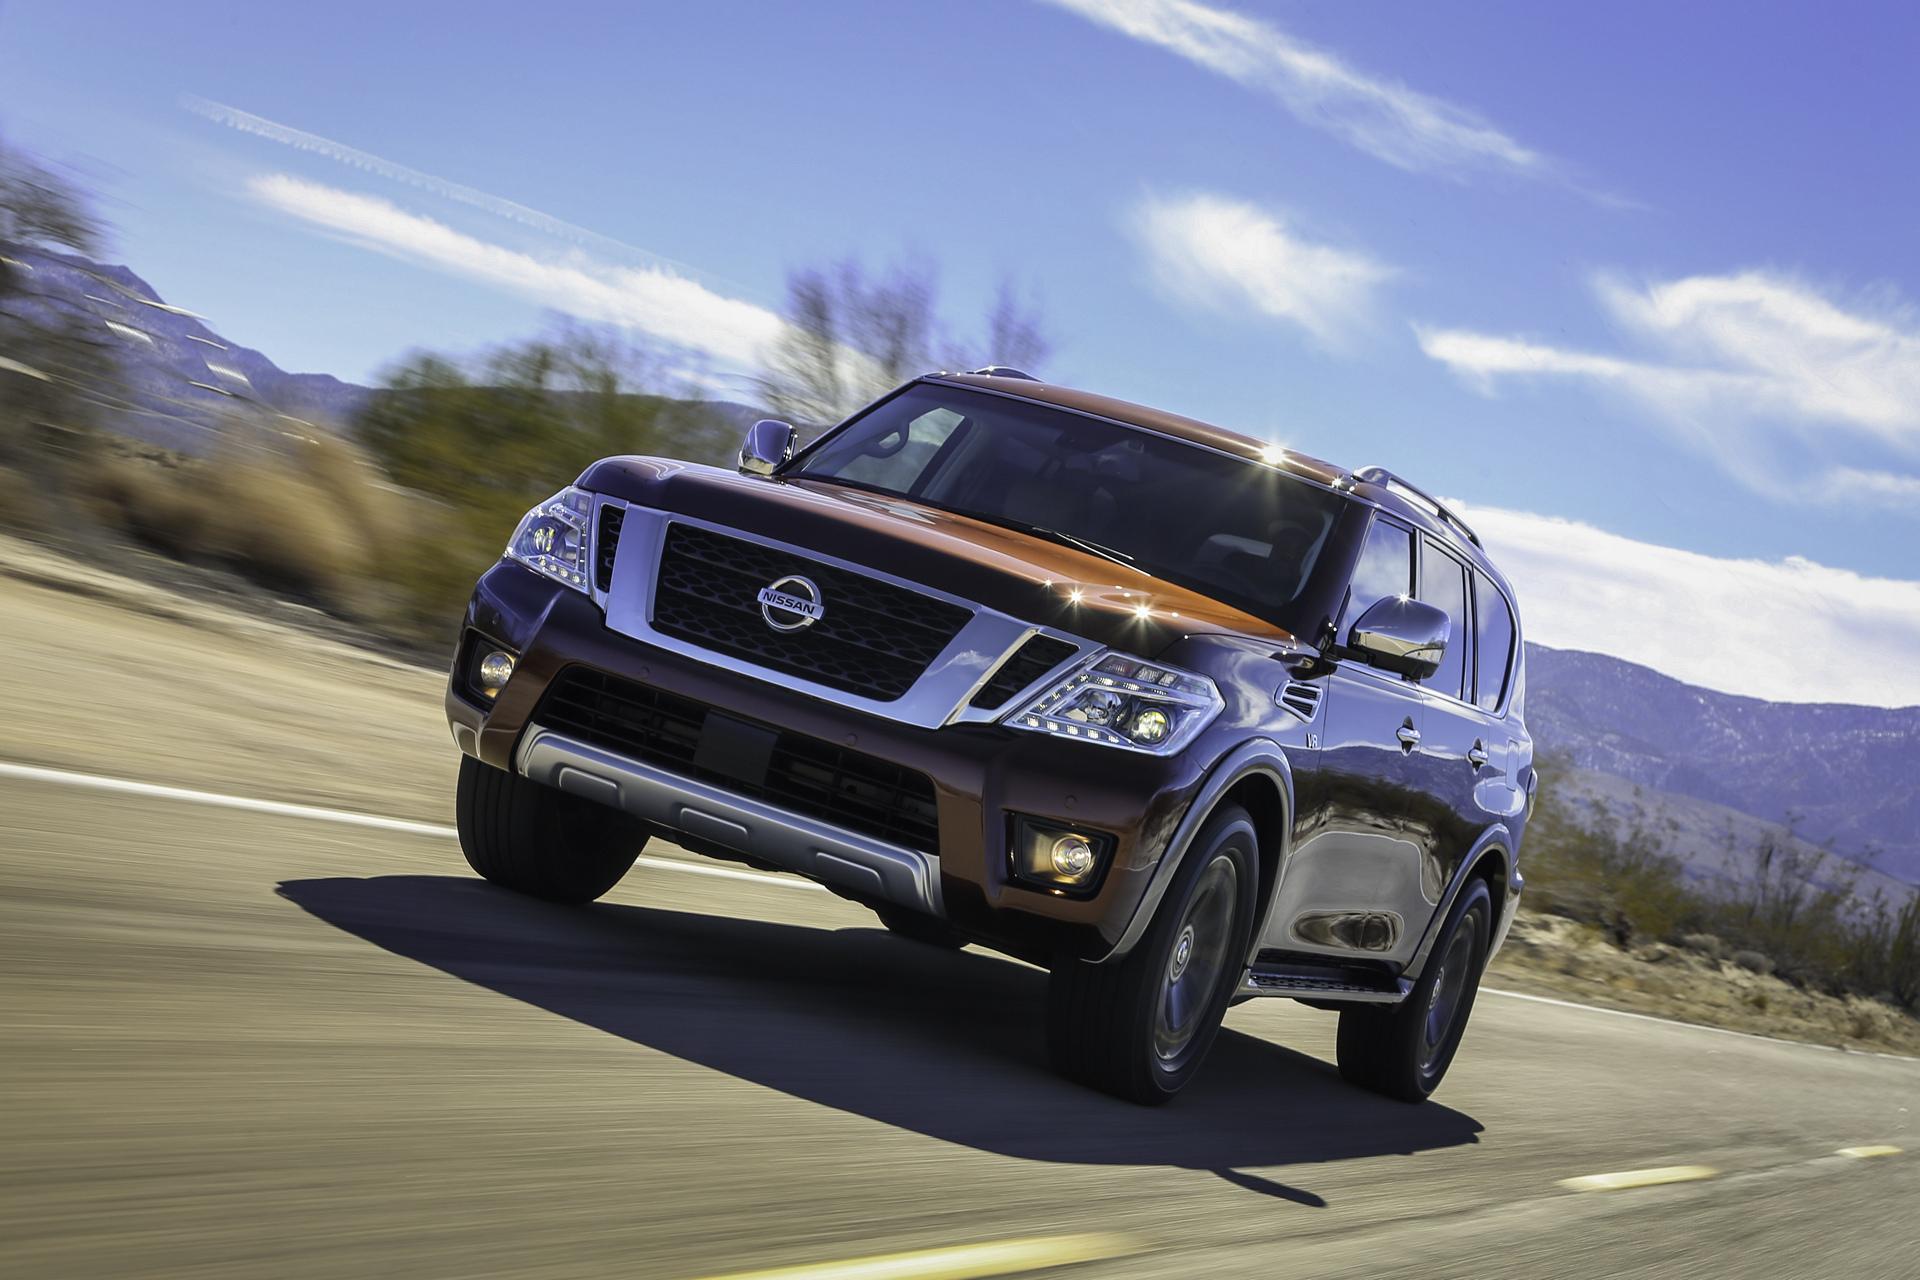 2017 Nissan Armada © Nissan Motor Co., Ltd.